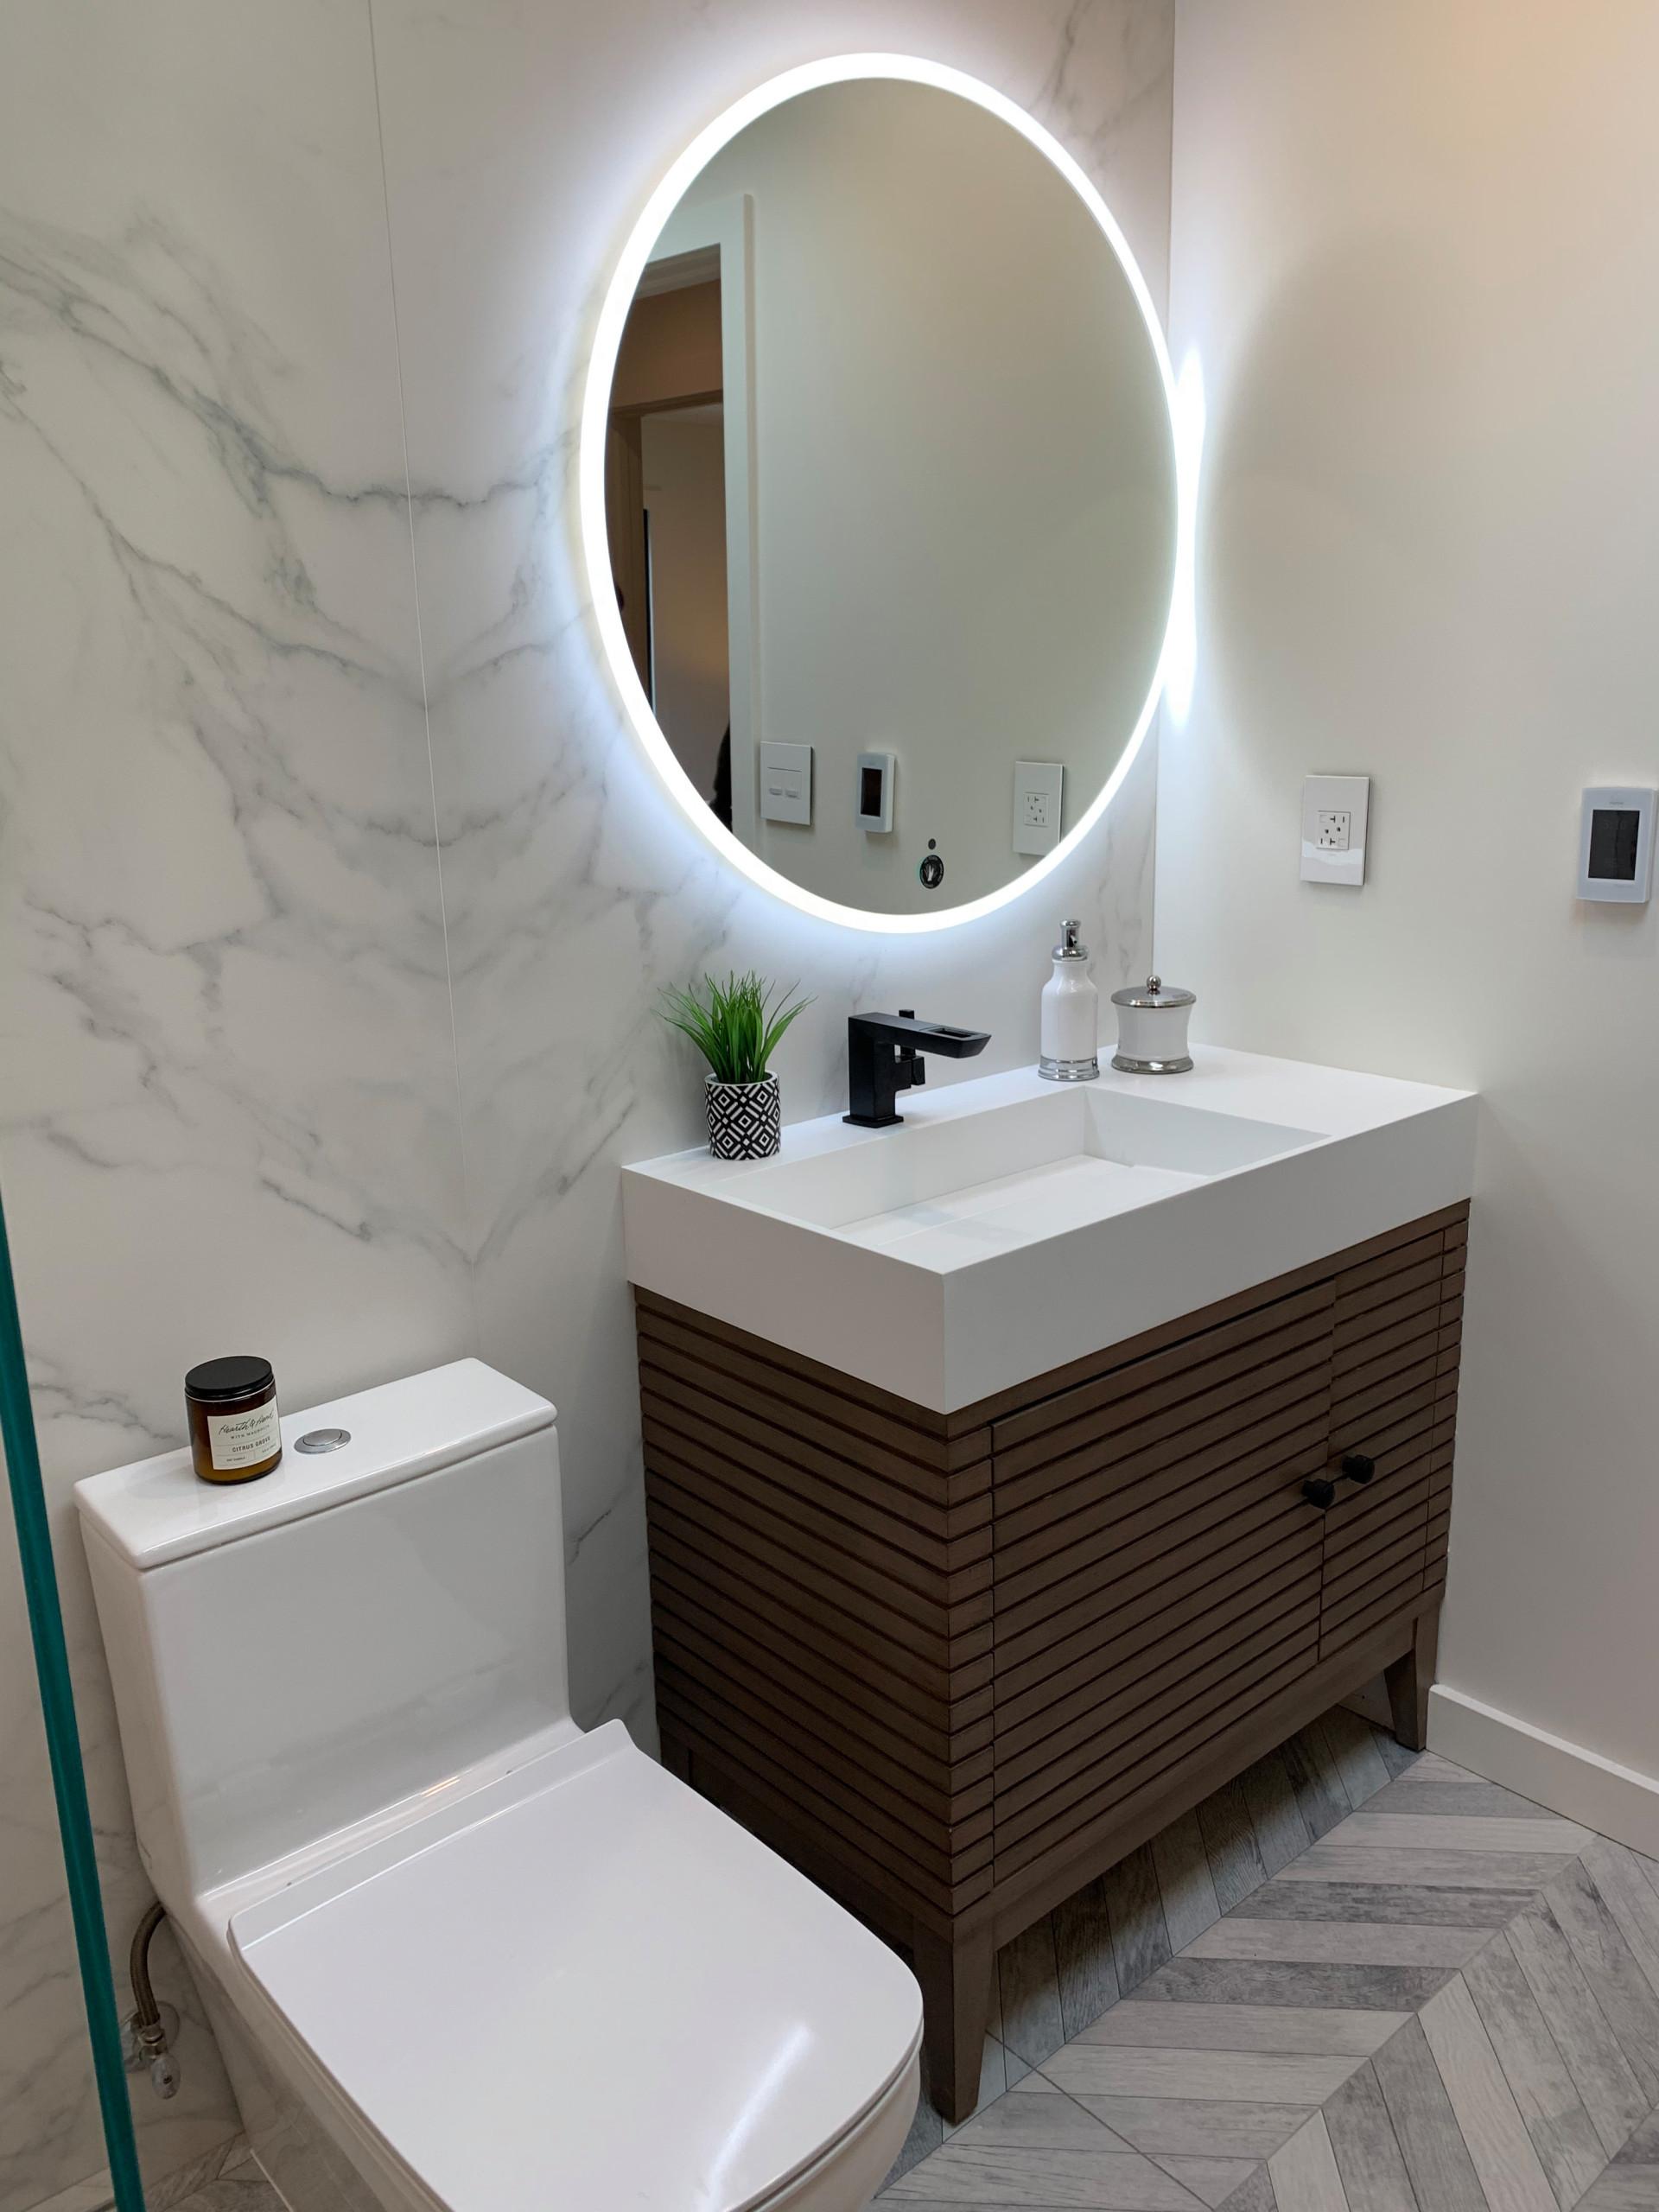 Modern Home Remodel in San Francisco